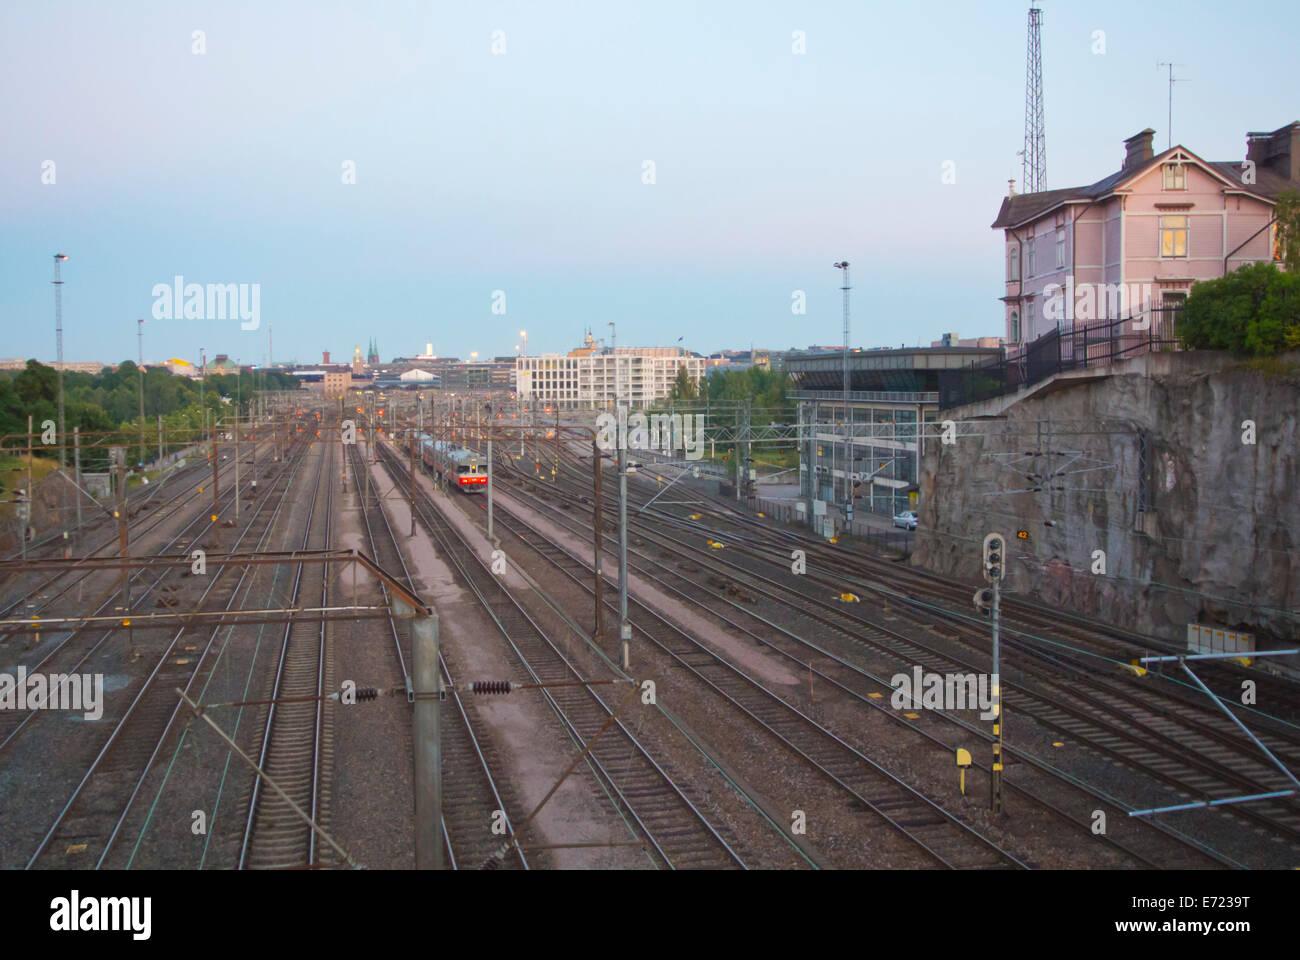 Railway tracks leading to railway station, Helsinki, Finland, Europe - Stock Image